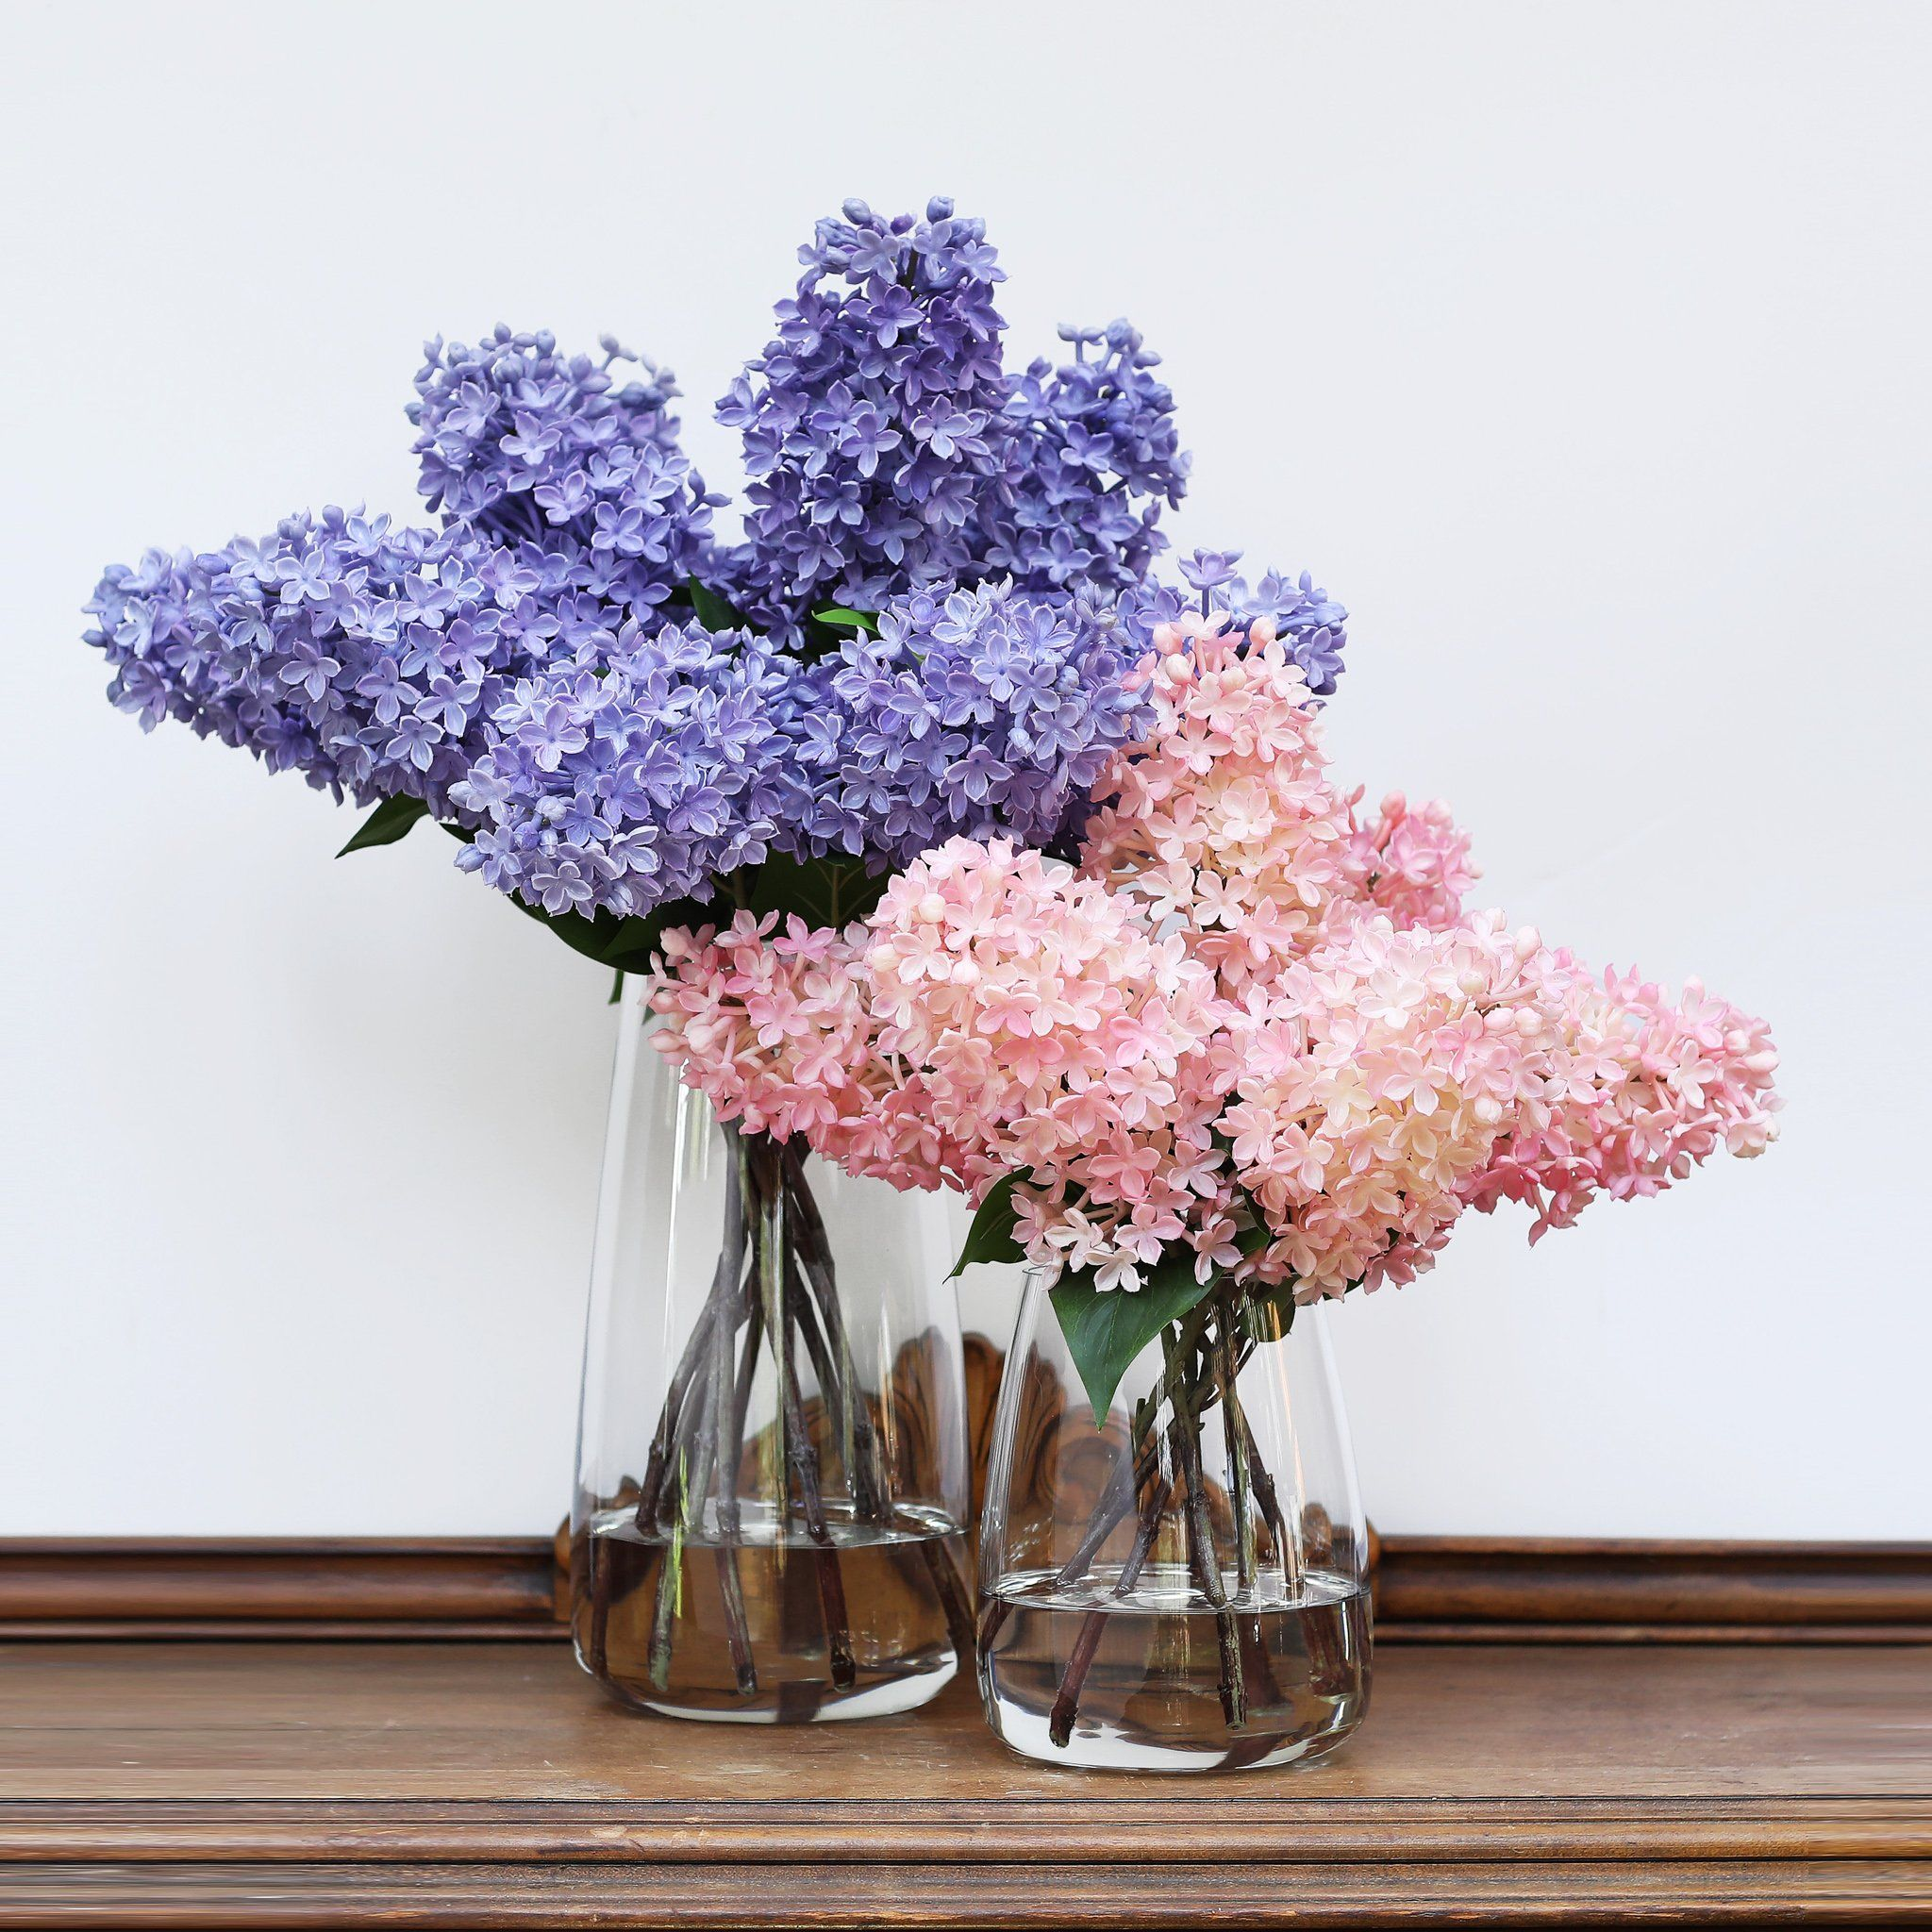 Lilac Floral Arrangement In Glass Vase Customized Size And Color Options Floral Arrangements Glass Vase Flower Arrangements Center Pieces